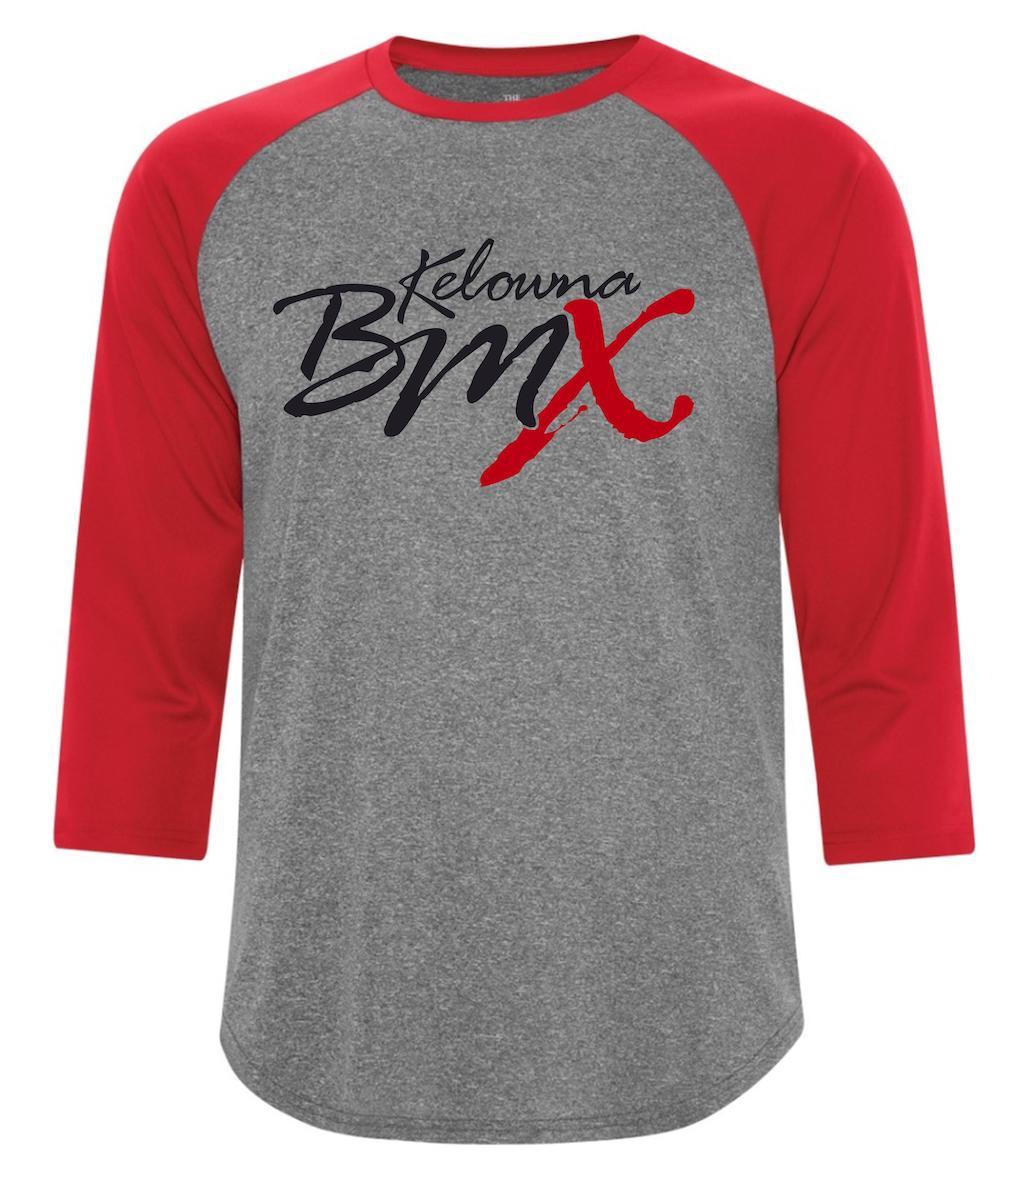 Kelowna BMX 3/4 Sleeve Tee